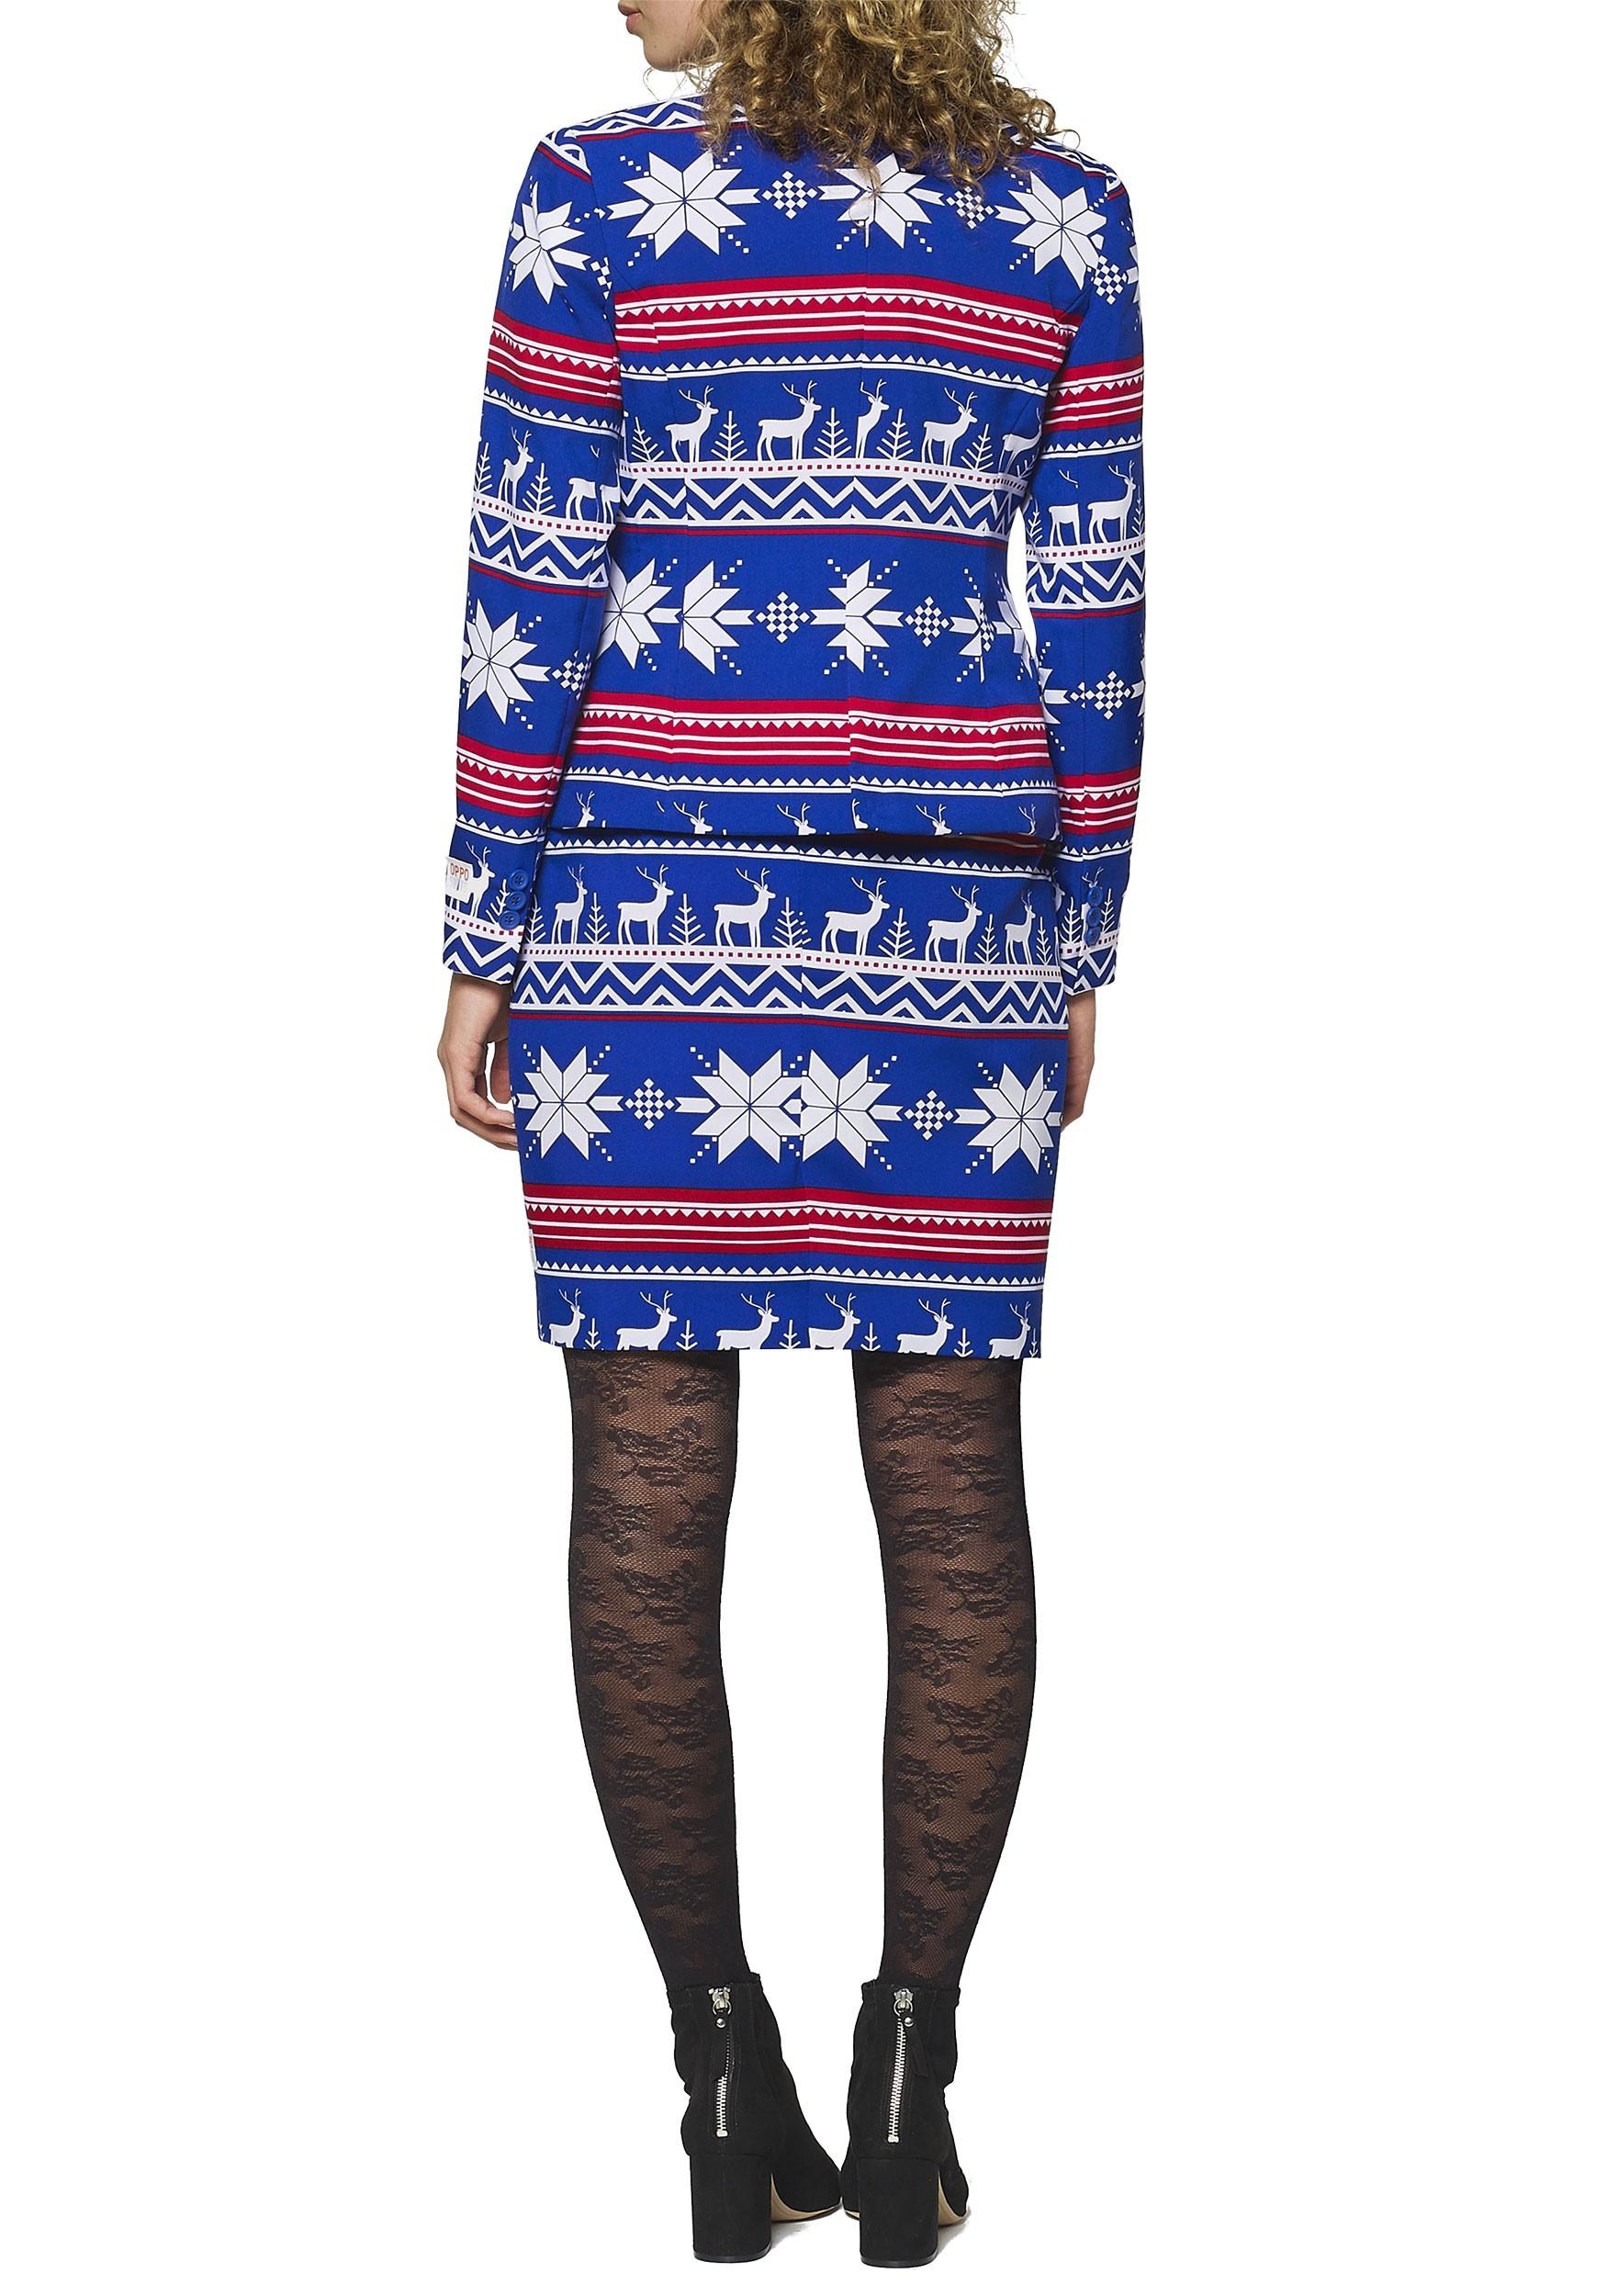 977382dacd84ef Women's Ugly Christmas Sweater OppoSuit